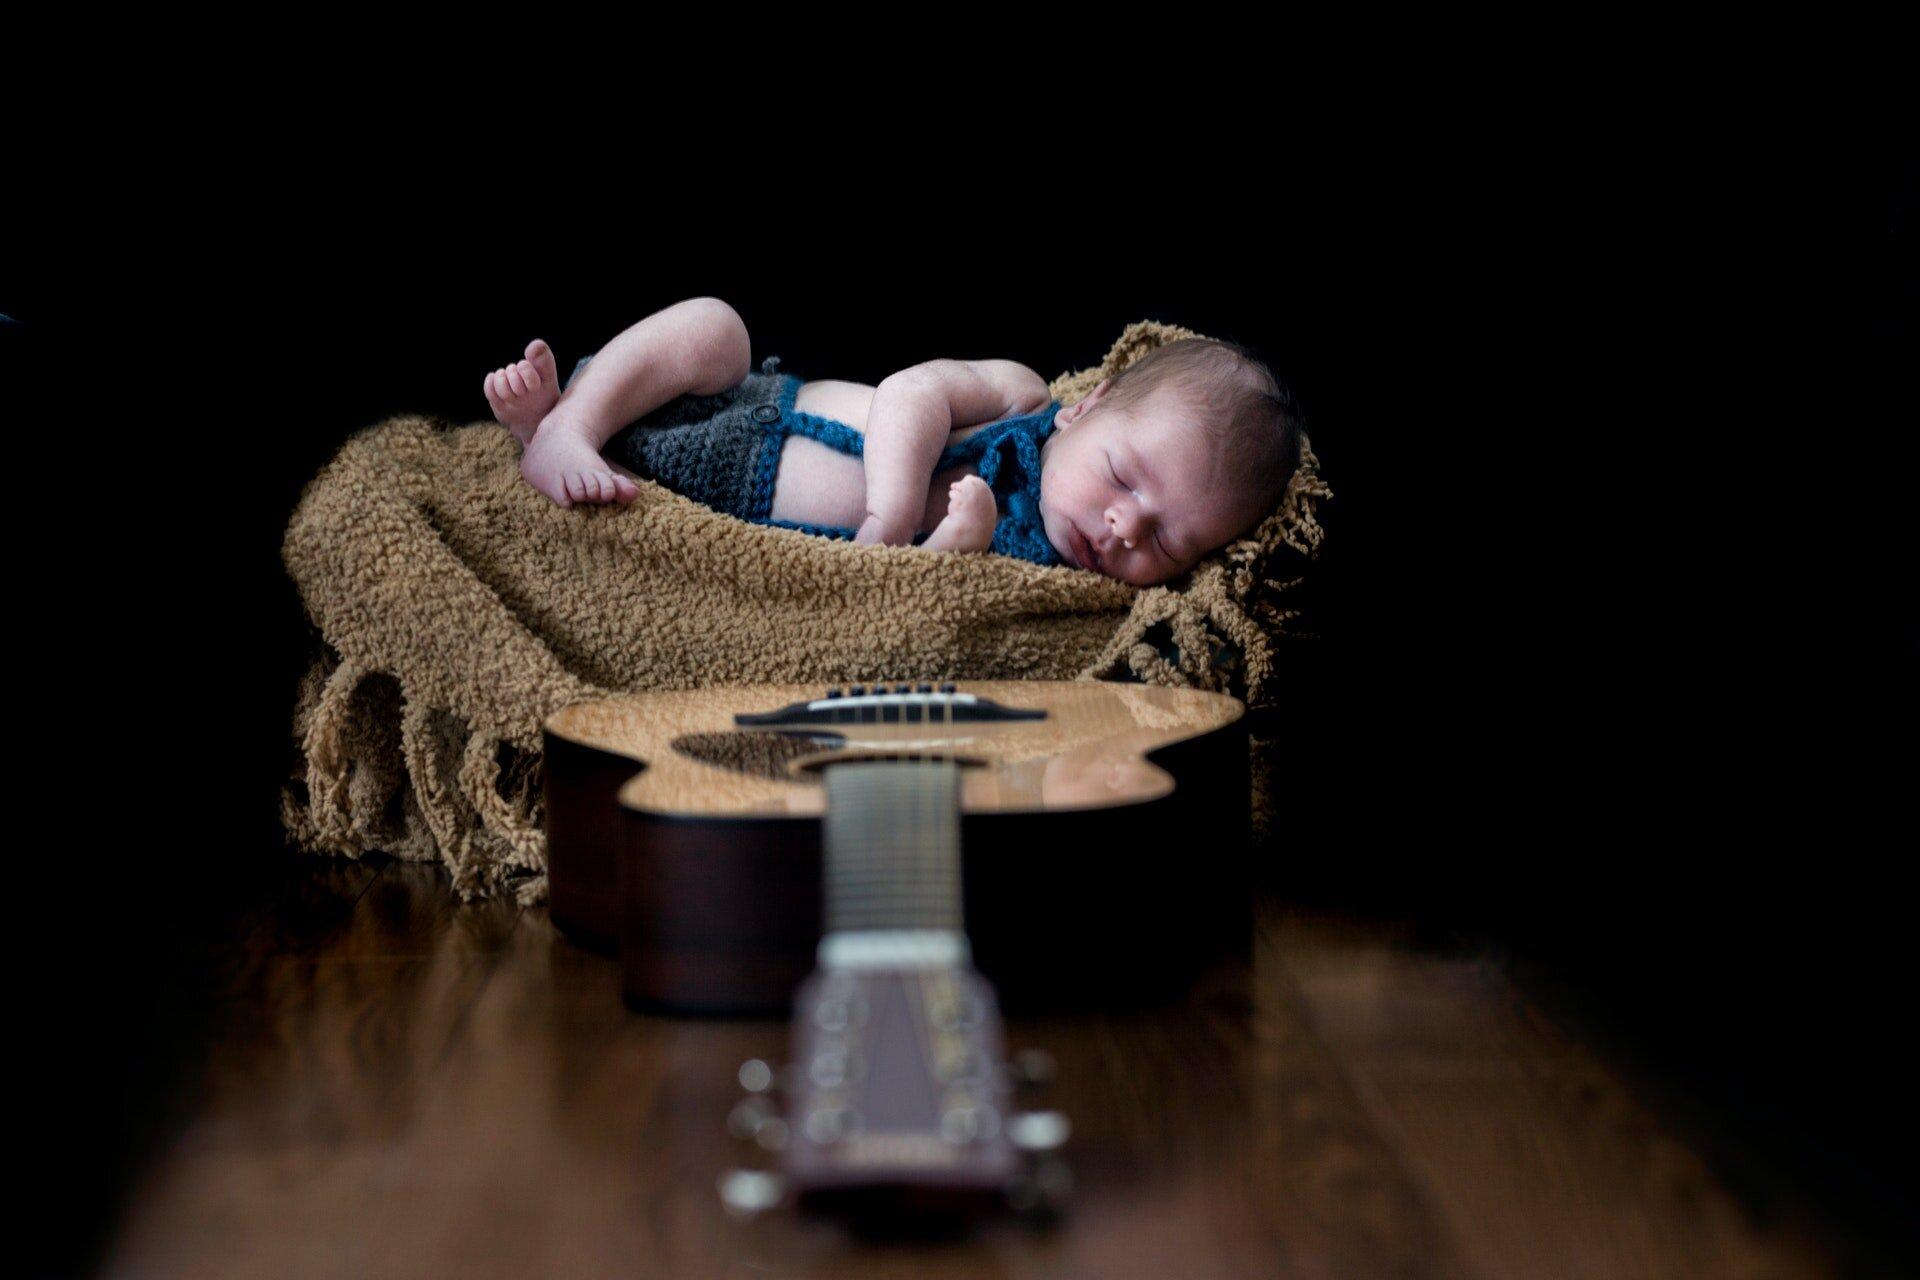 props for newborn photography | photokiakotos